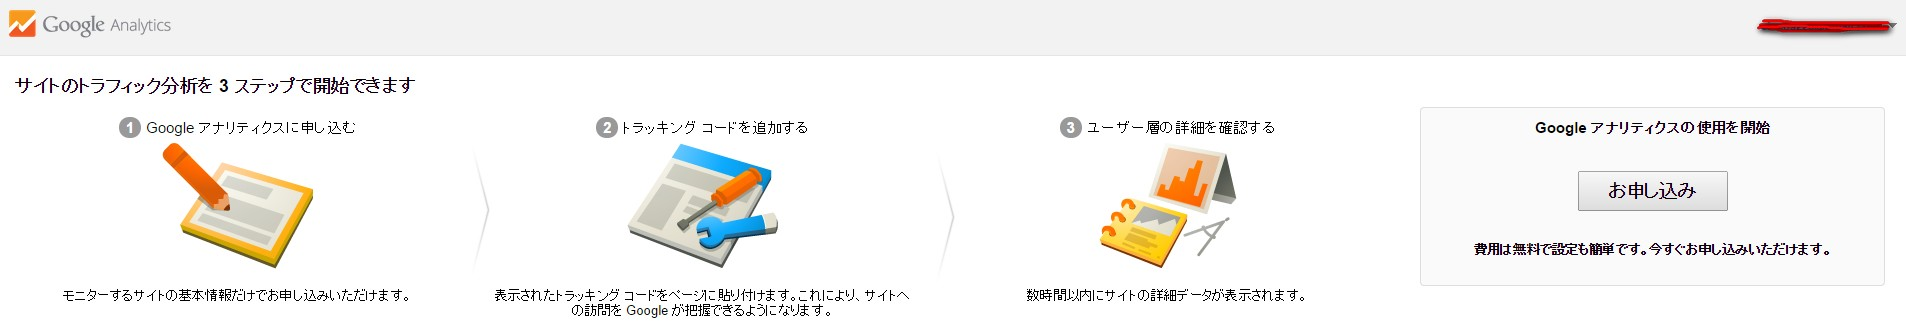 2014-09-22_160132